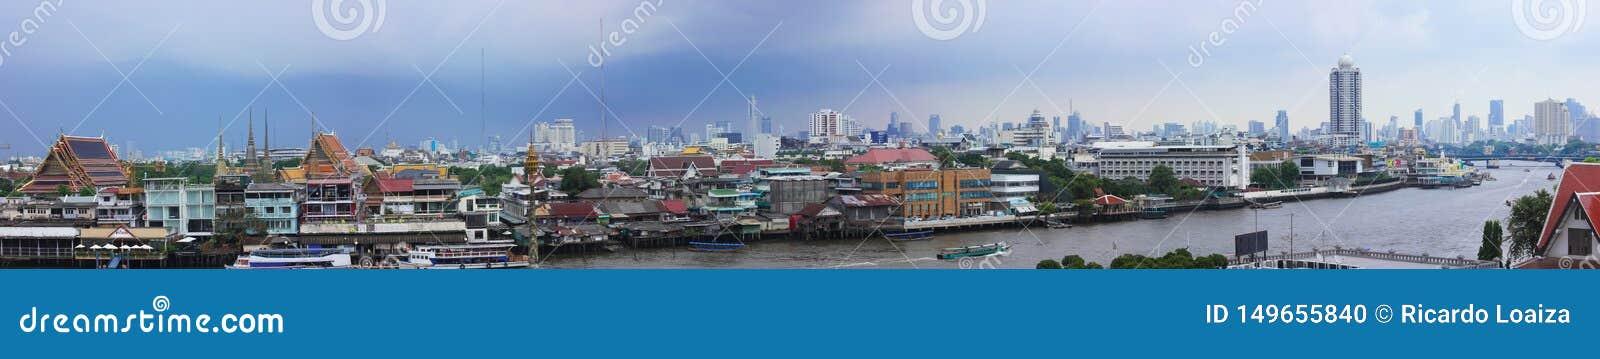 Panorama- bild av Bangkok som visar Chao Phraya River